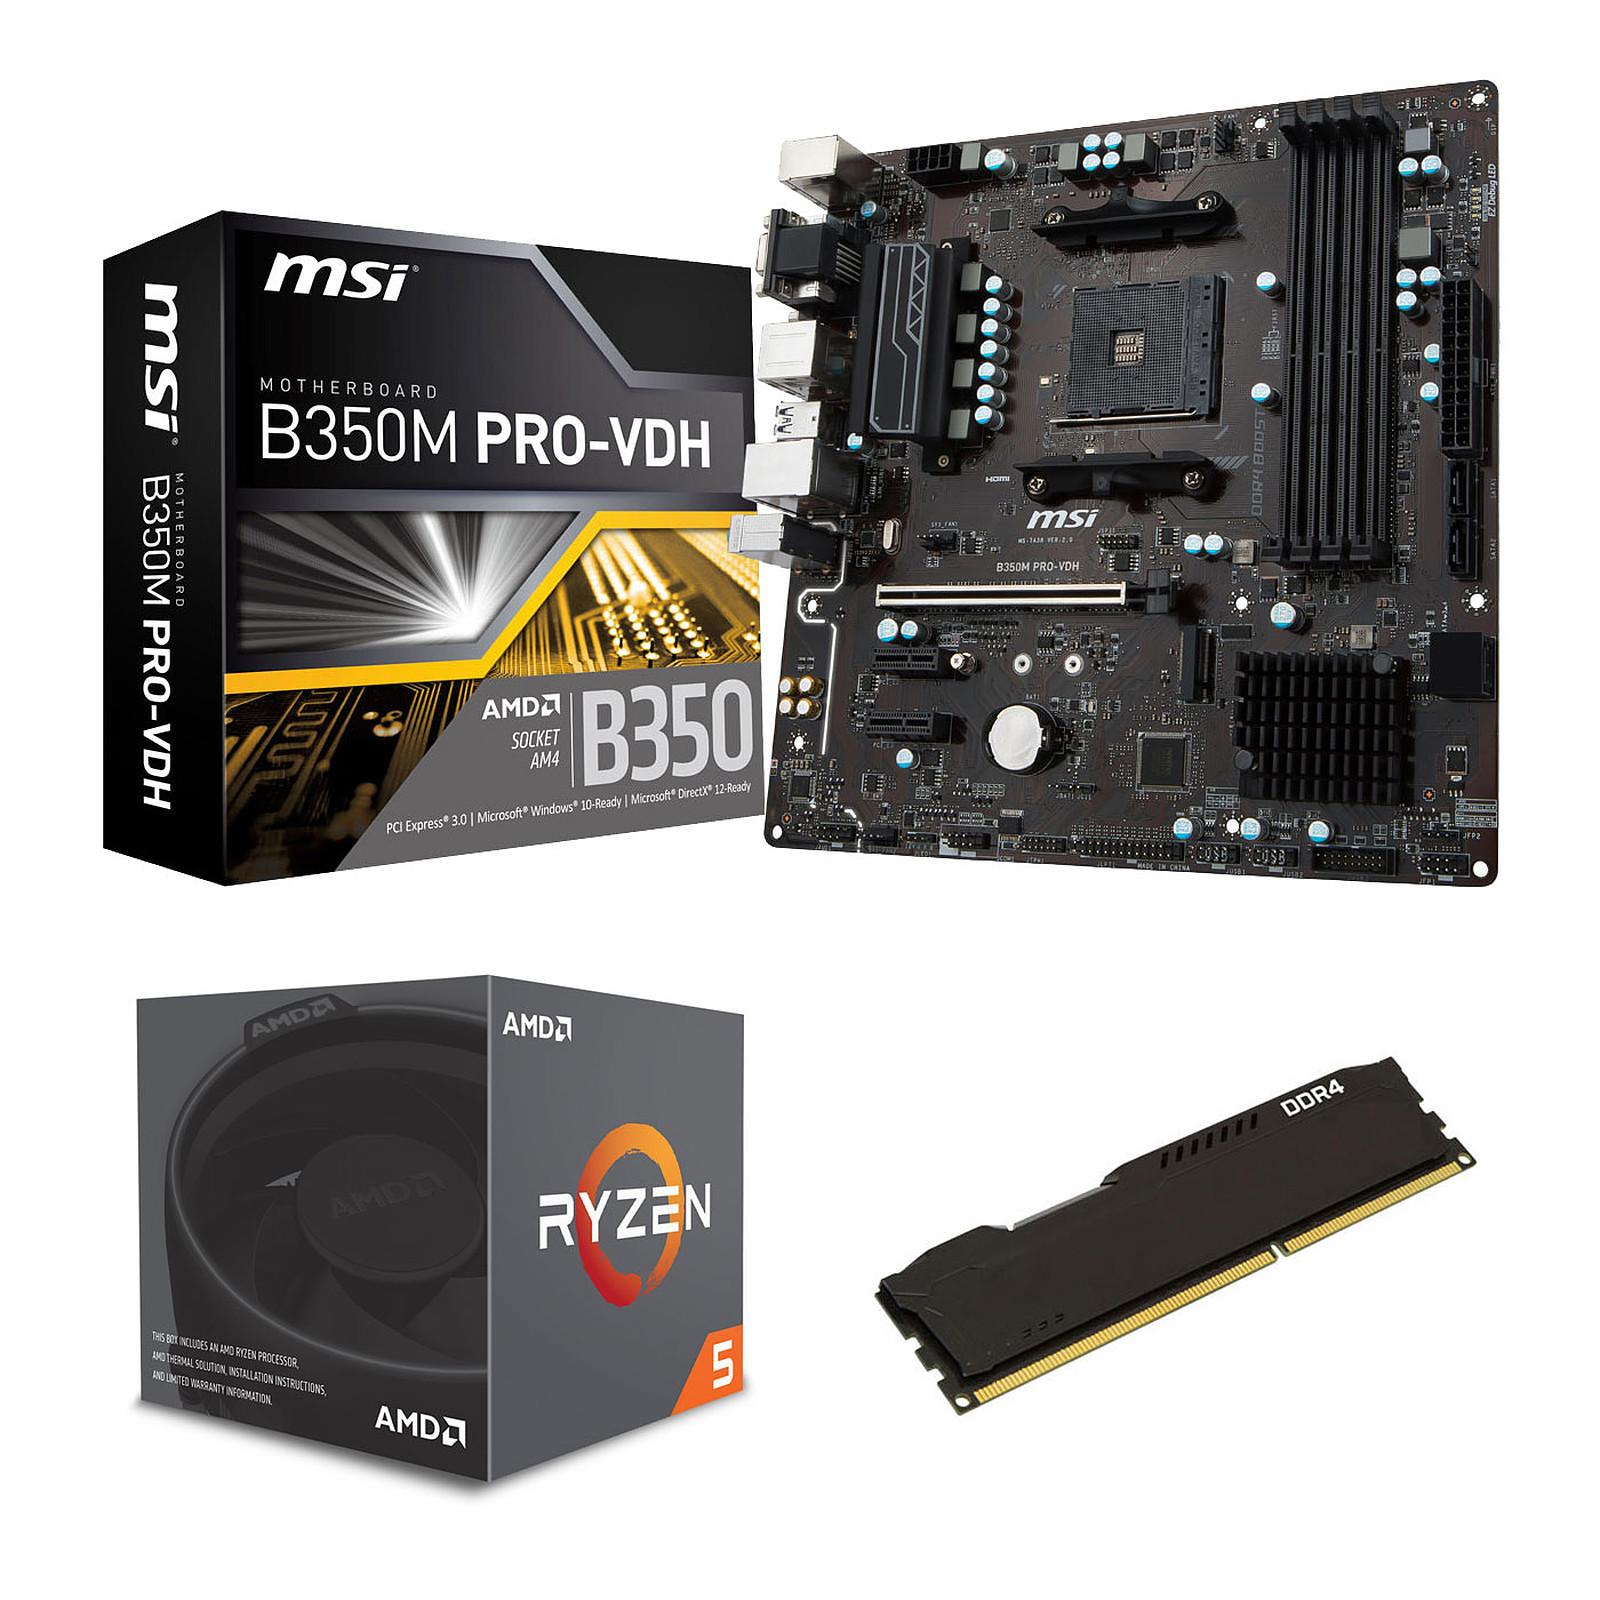 Kit Upgrade PC AMD Ryzen 5 1600 MSI B350M PRO-VDH 8 Go